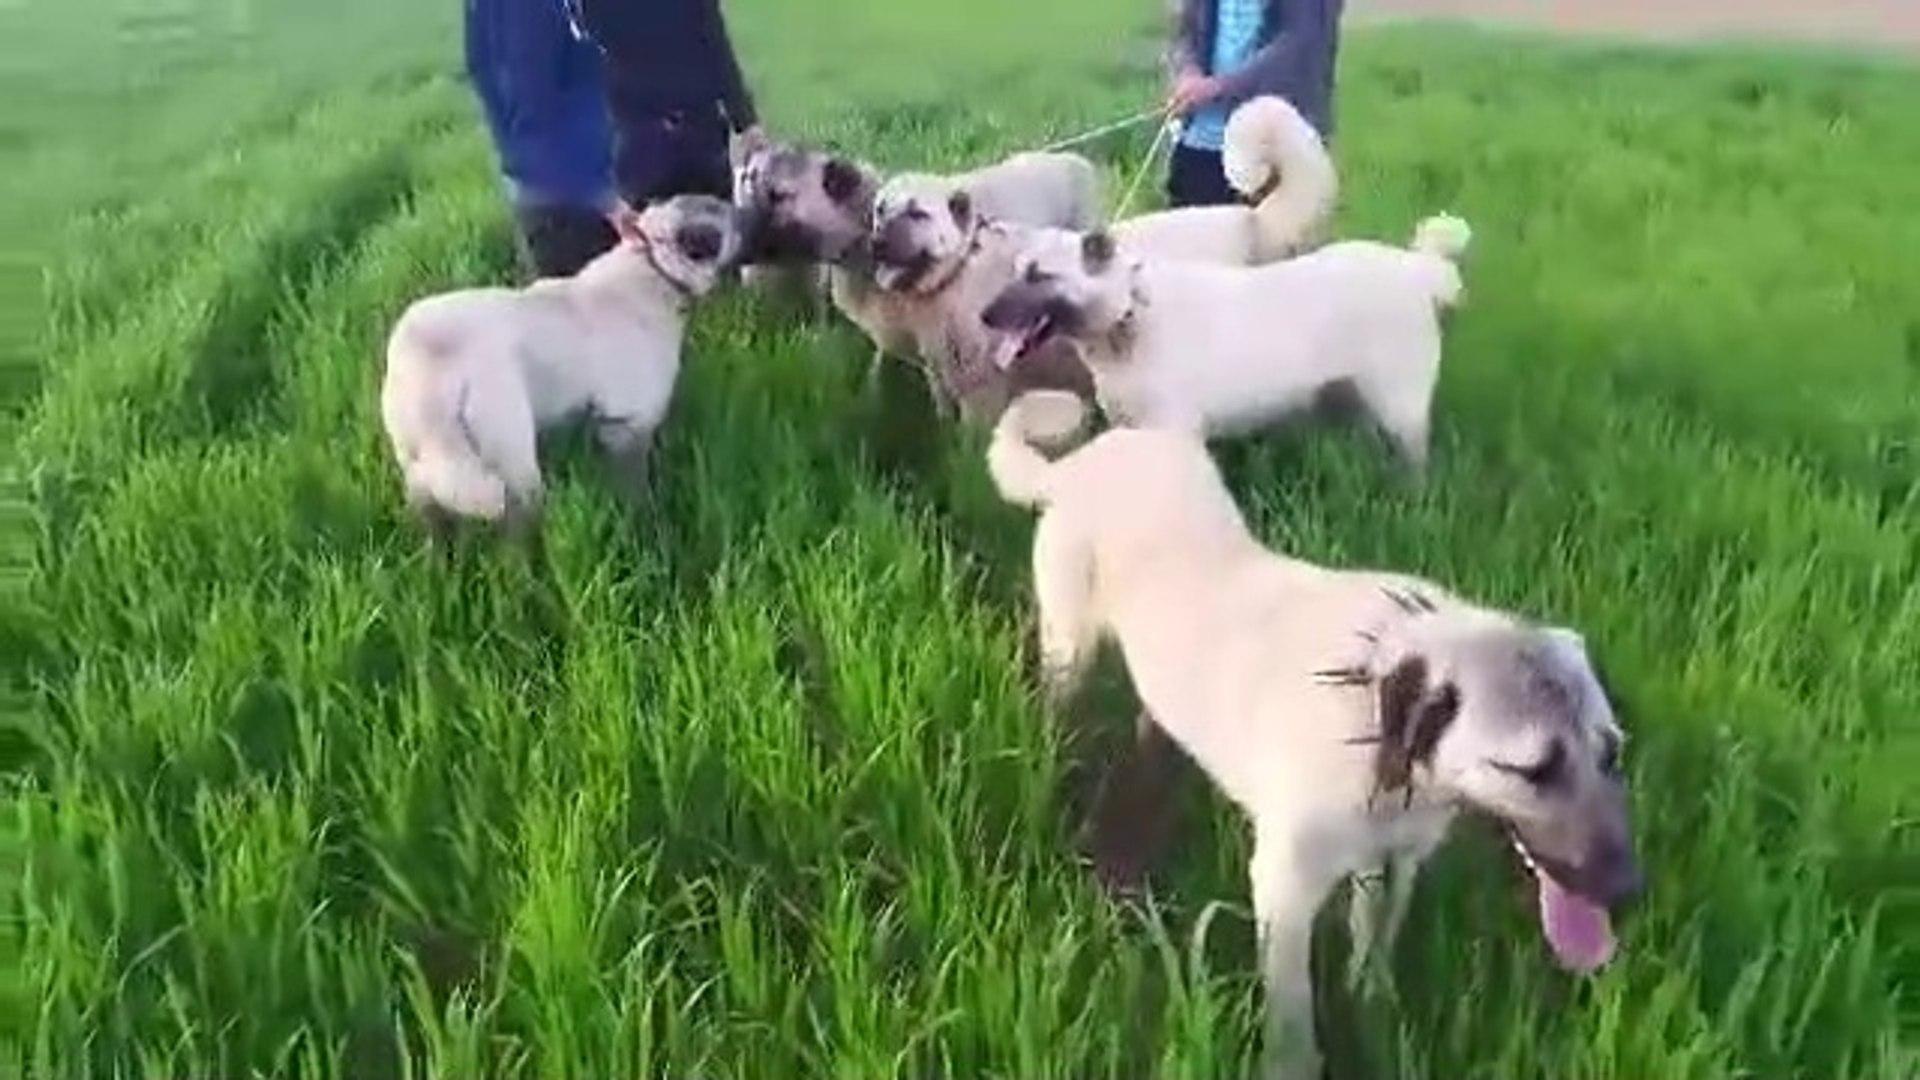 KANGAL KOPEKLERi TOPYEKUN BiRARADA - KANGAL SHEPHERD DOGS